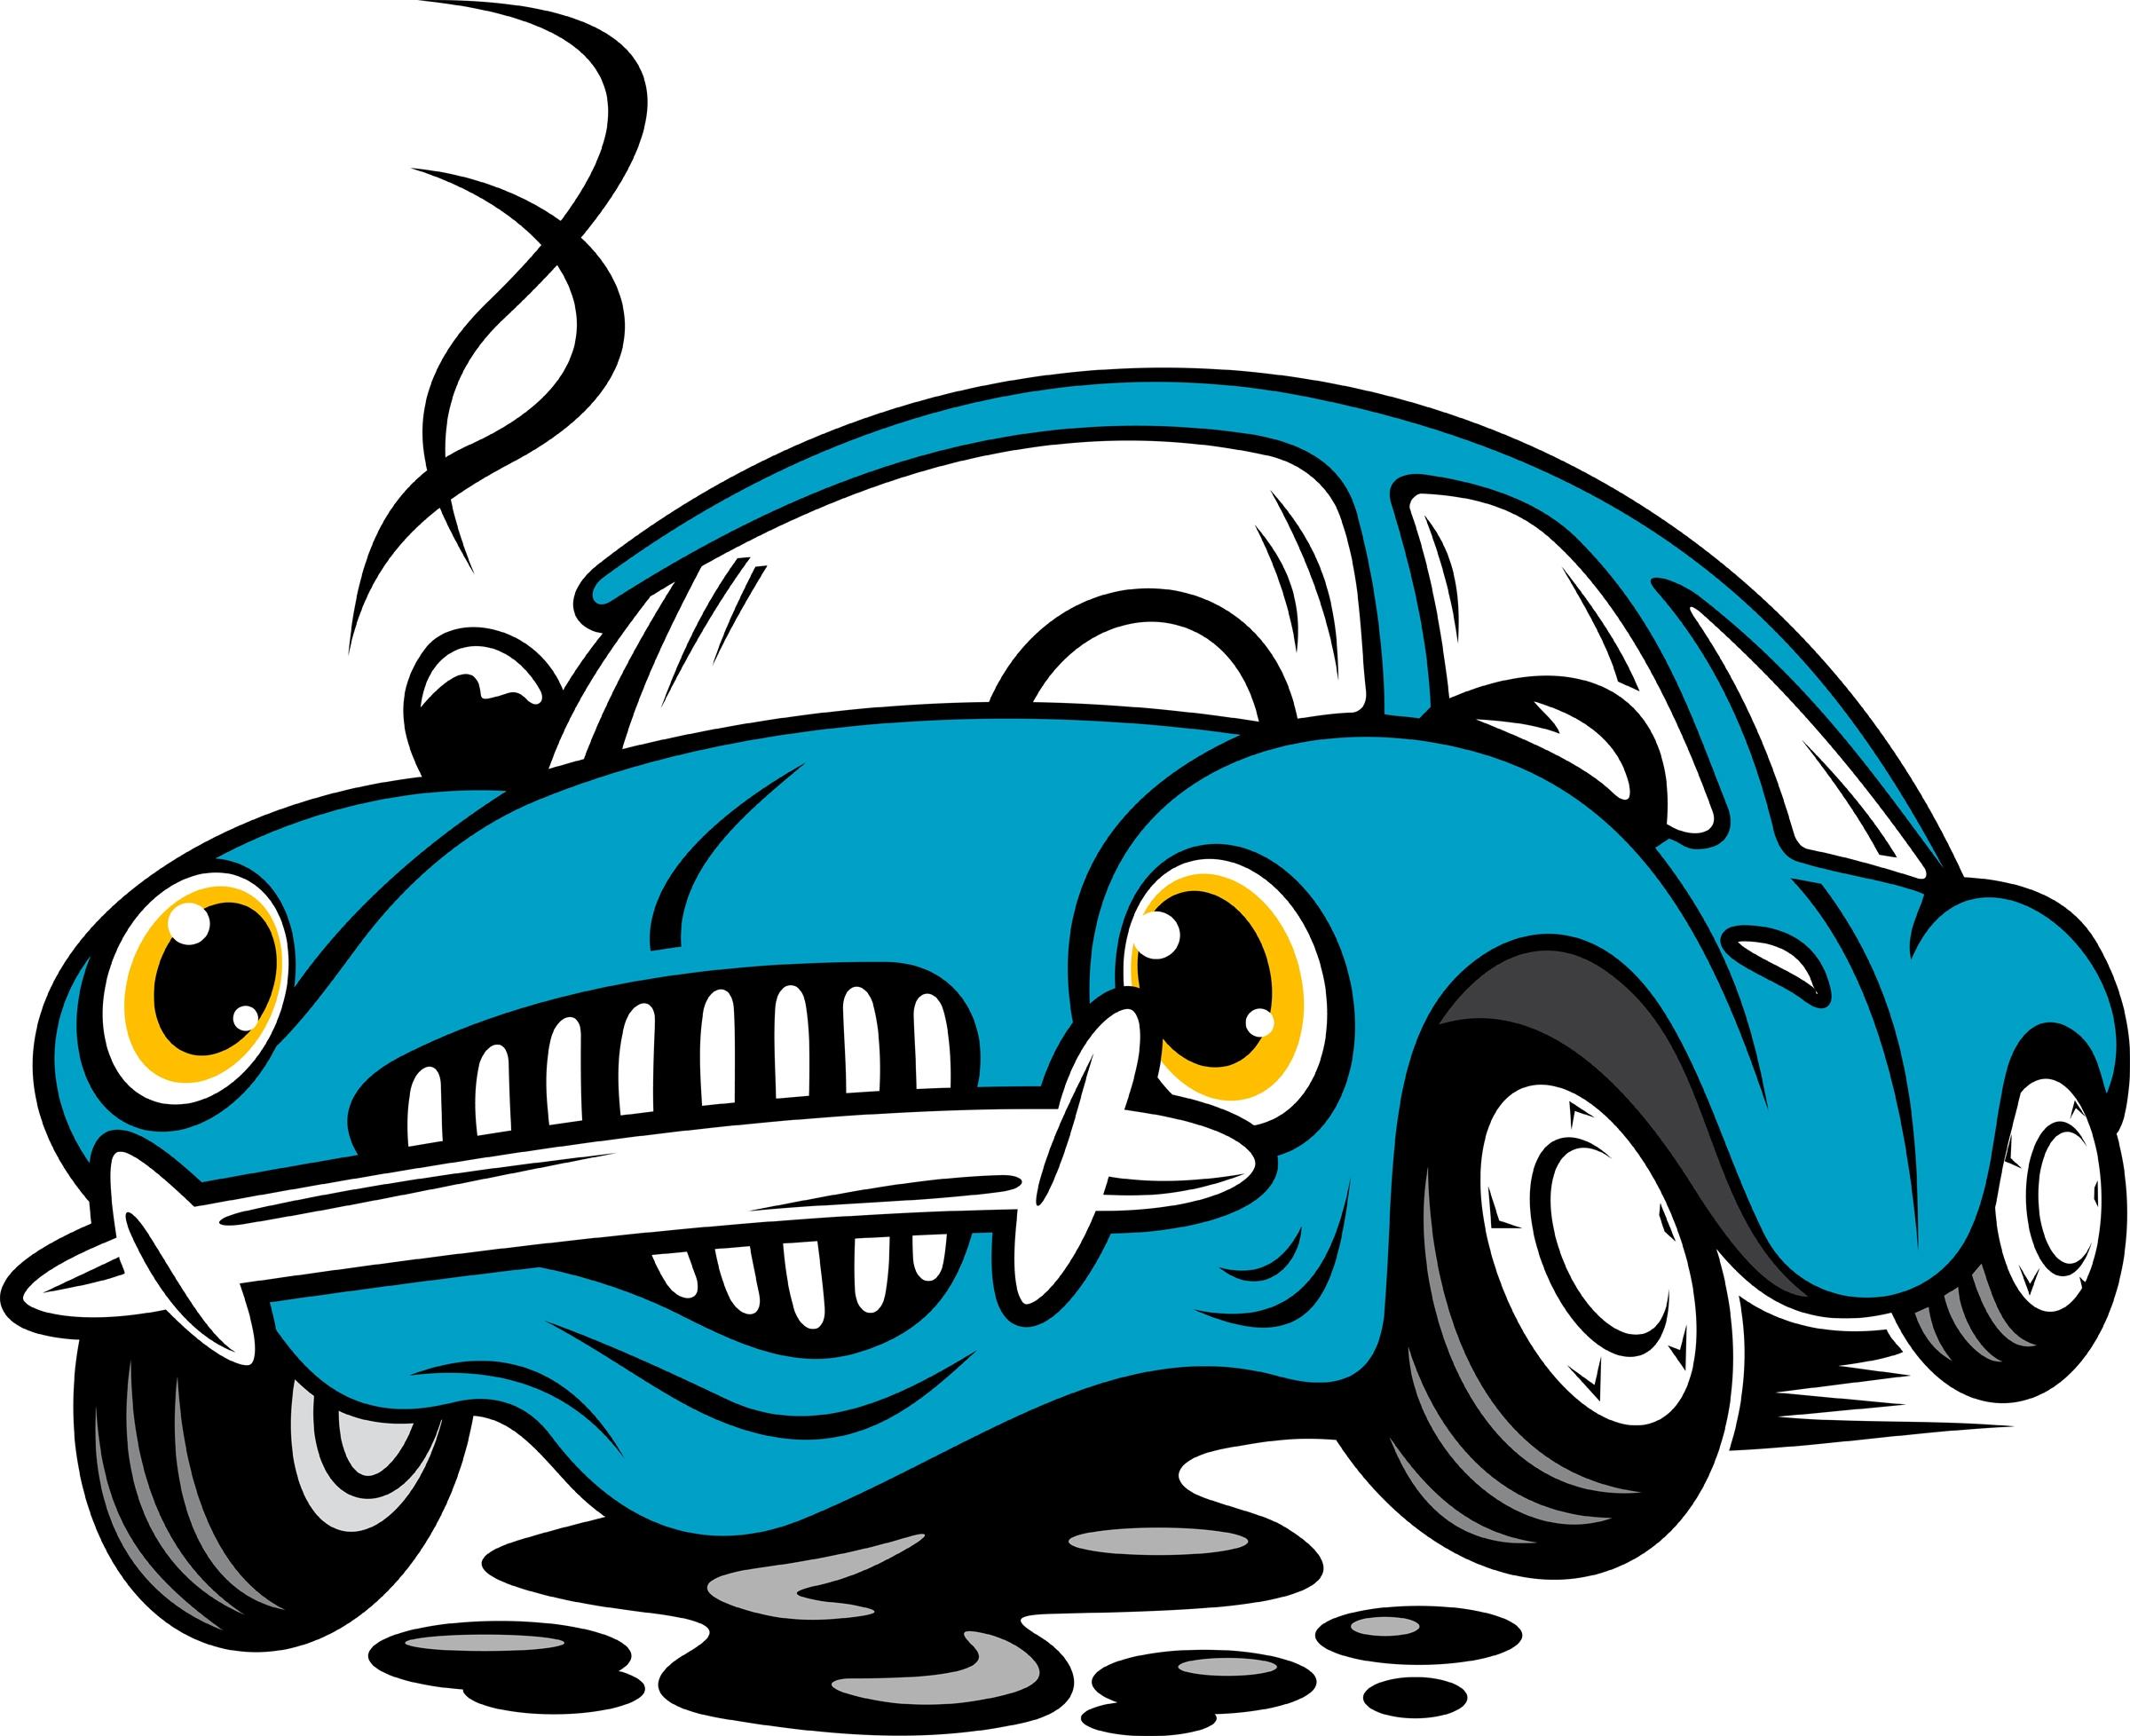 Damage car clipart svg transparent Wrecked Car Drawing   Free download best Wrecked Car Drawing on ... svg transparent